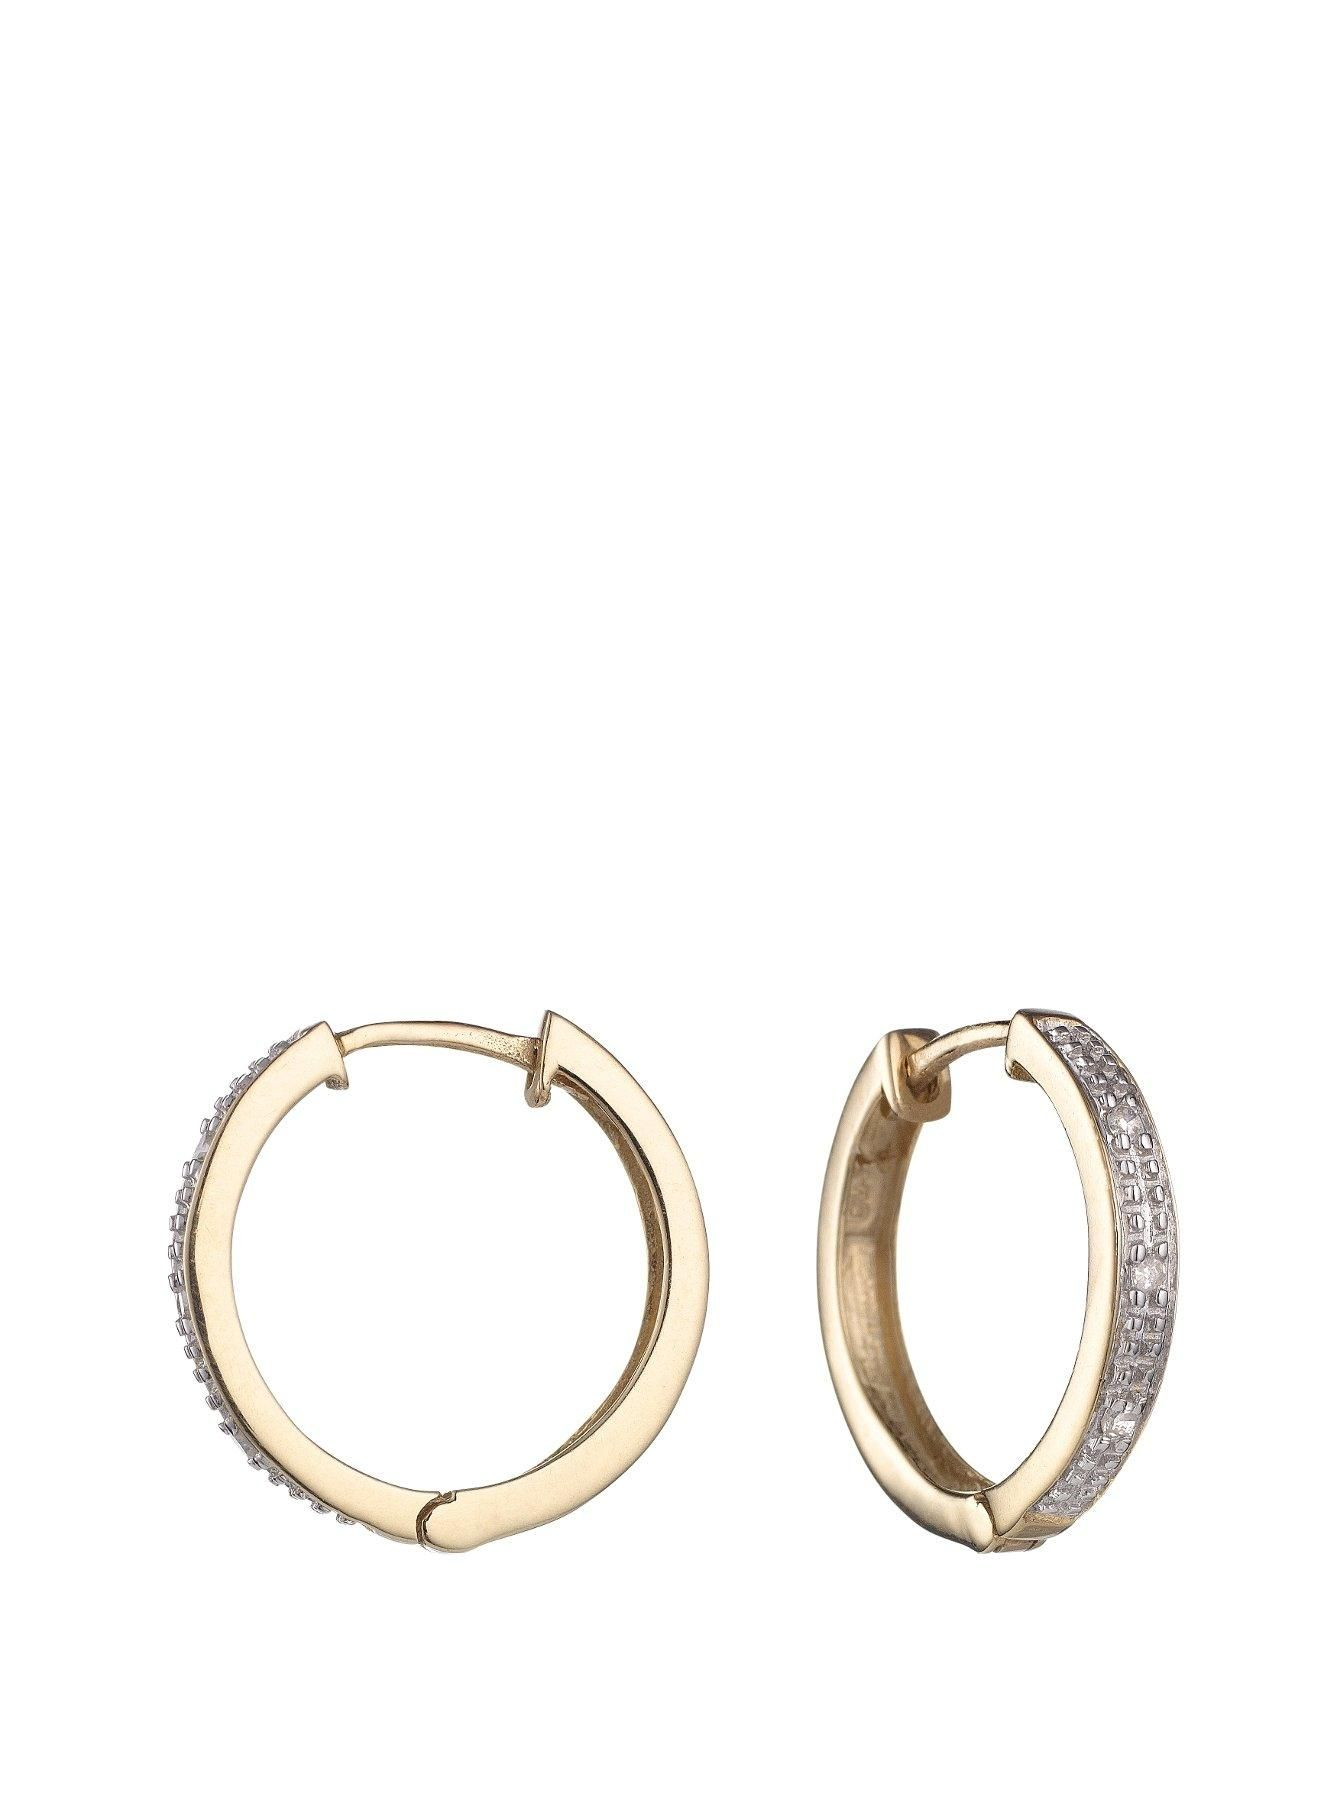 Ladies Earrings Small Huggie Ear Hoops Set Stylish Punk Style Jewelry Gifts KI